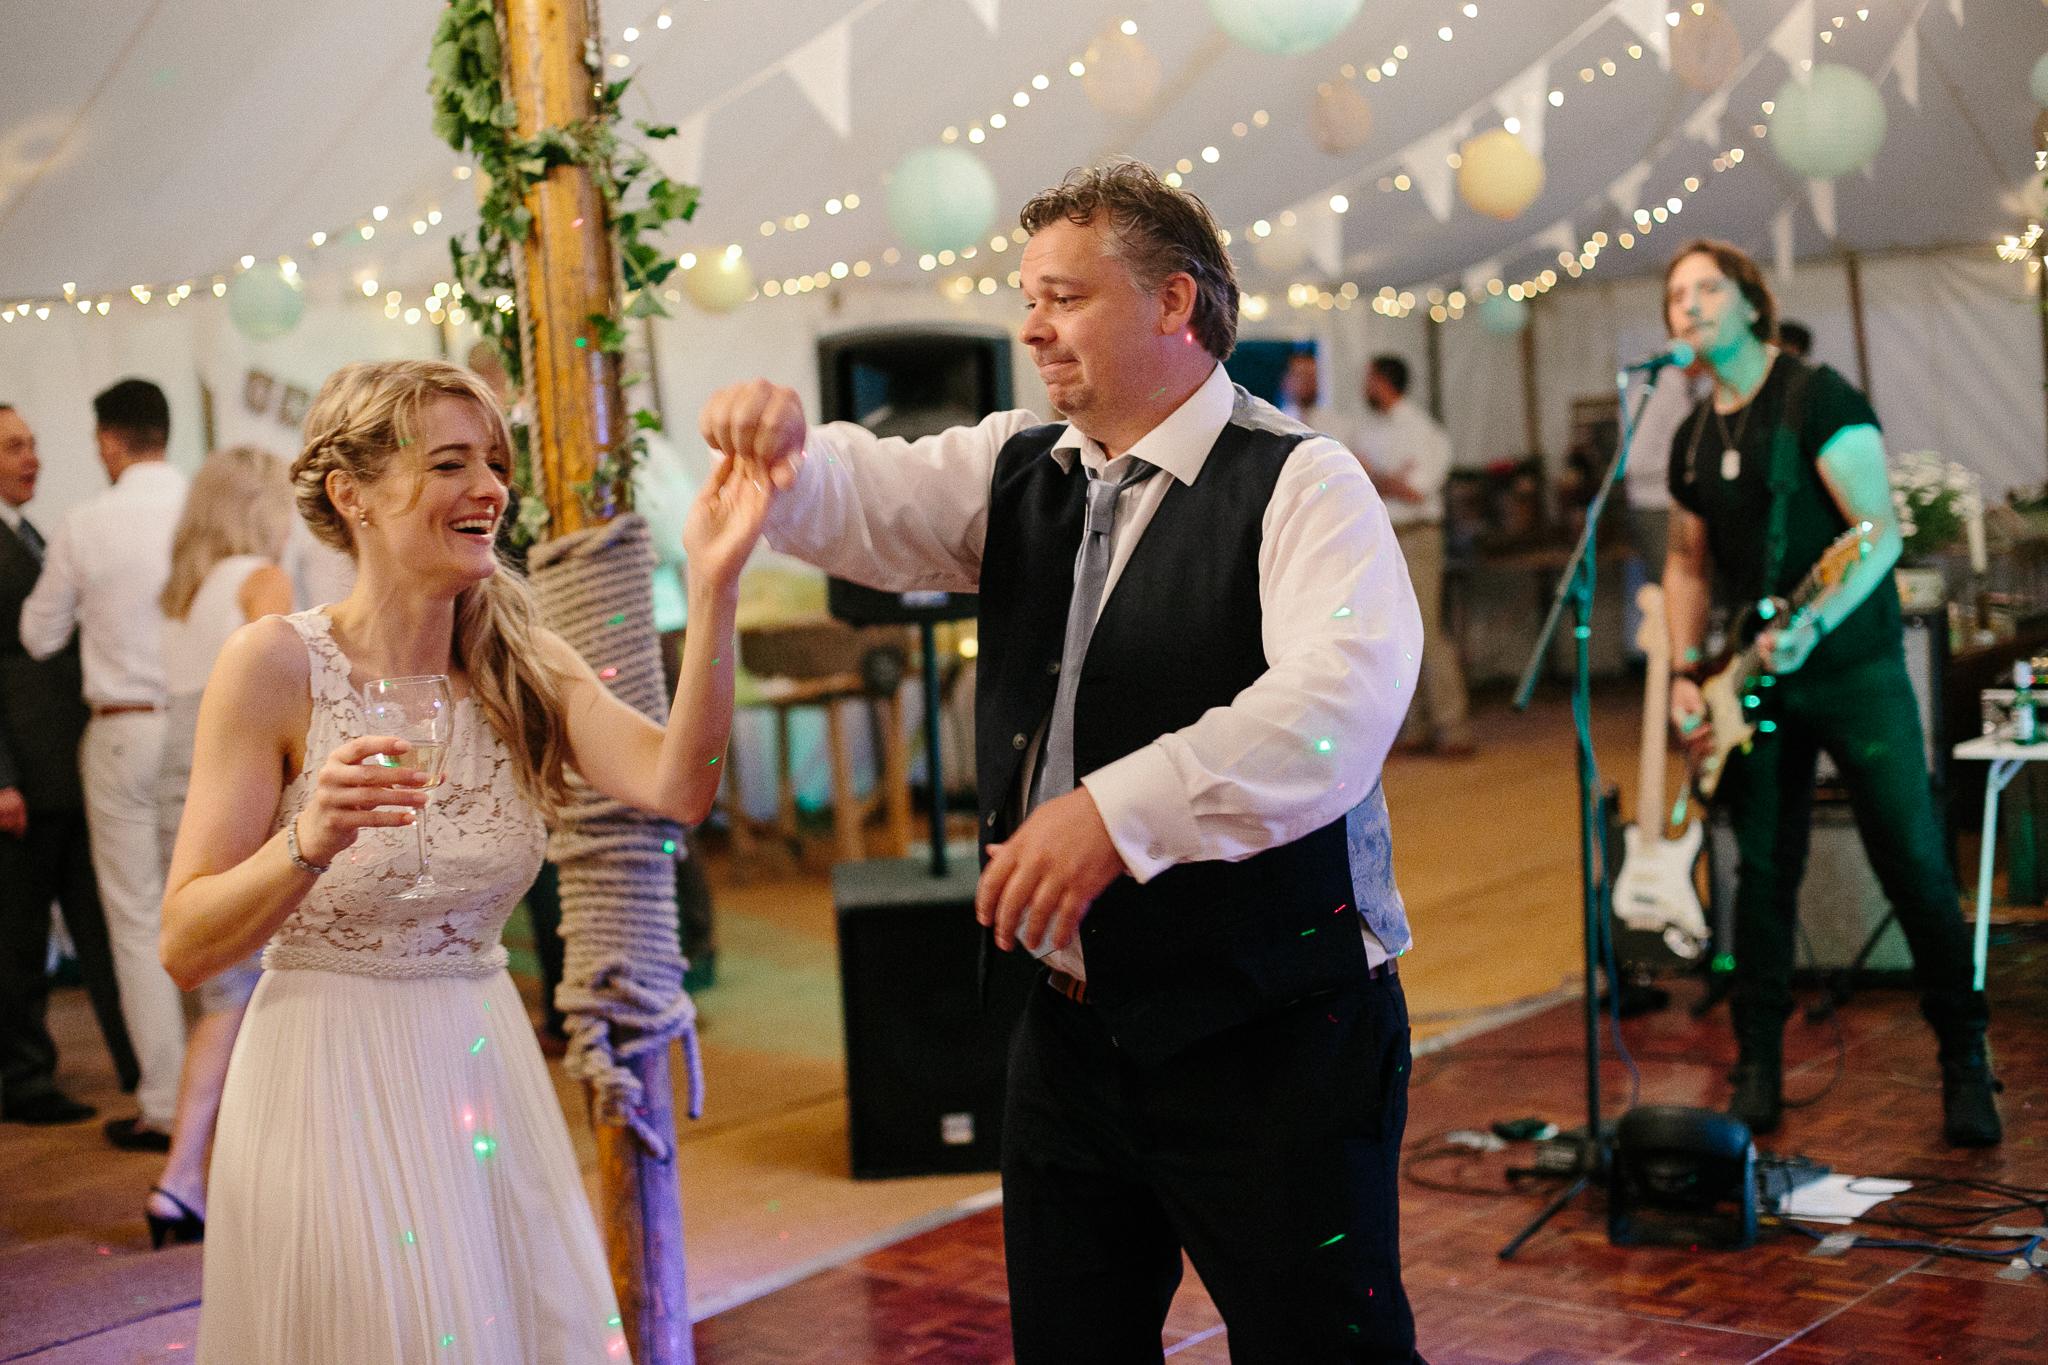 grantham_wedding_photographer-114.jpg